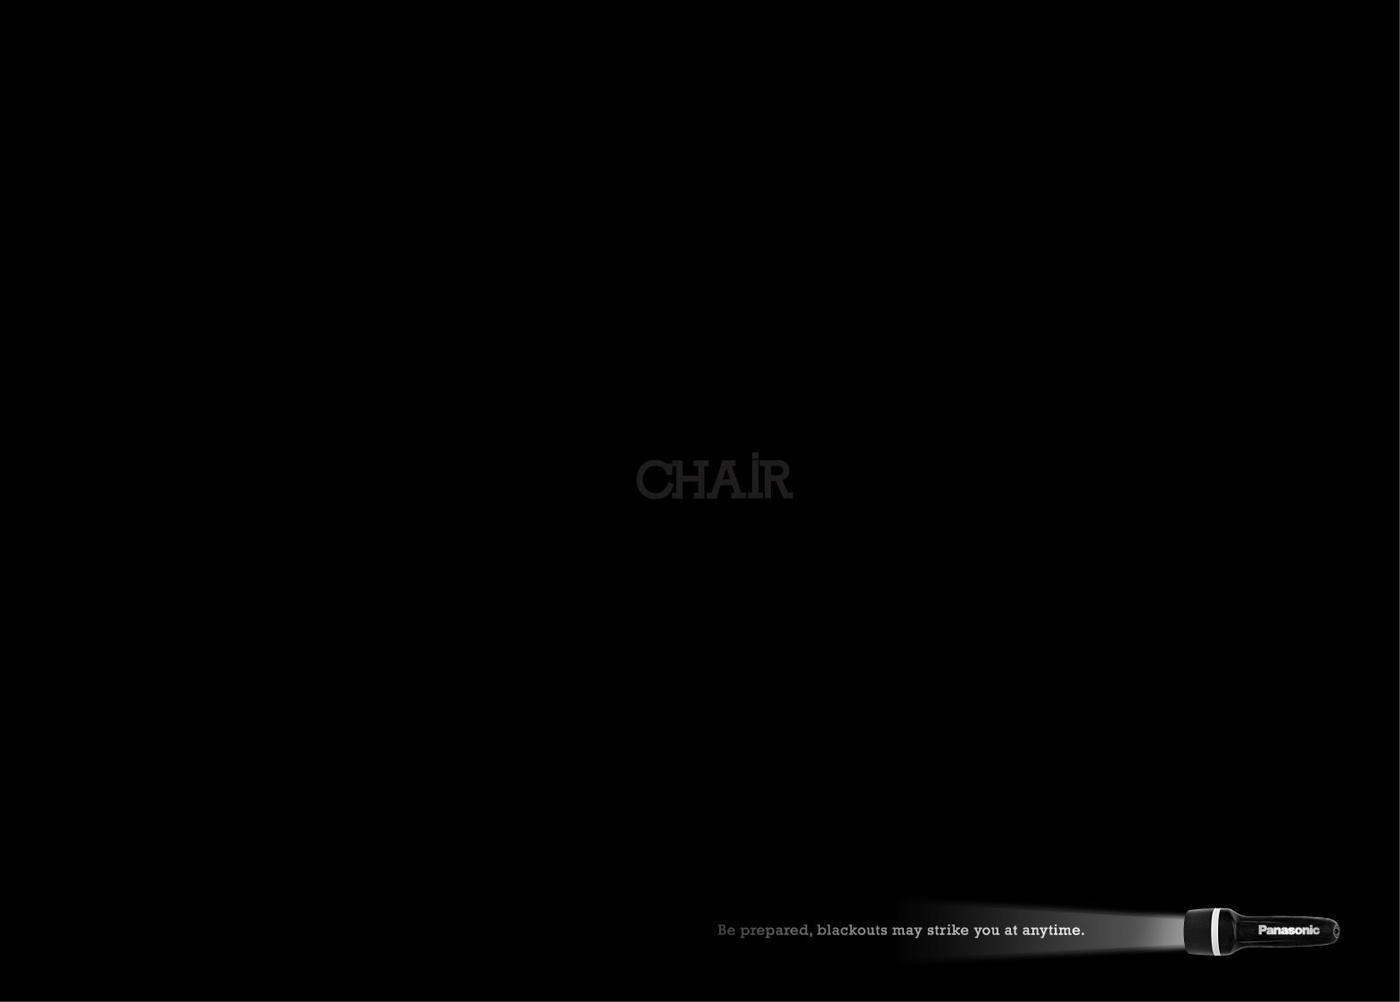 Panasonic Print Ad -  Chair